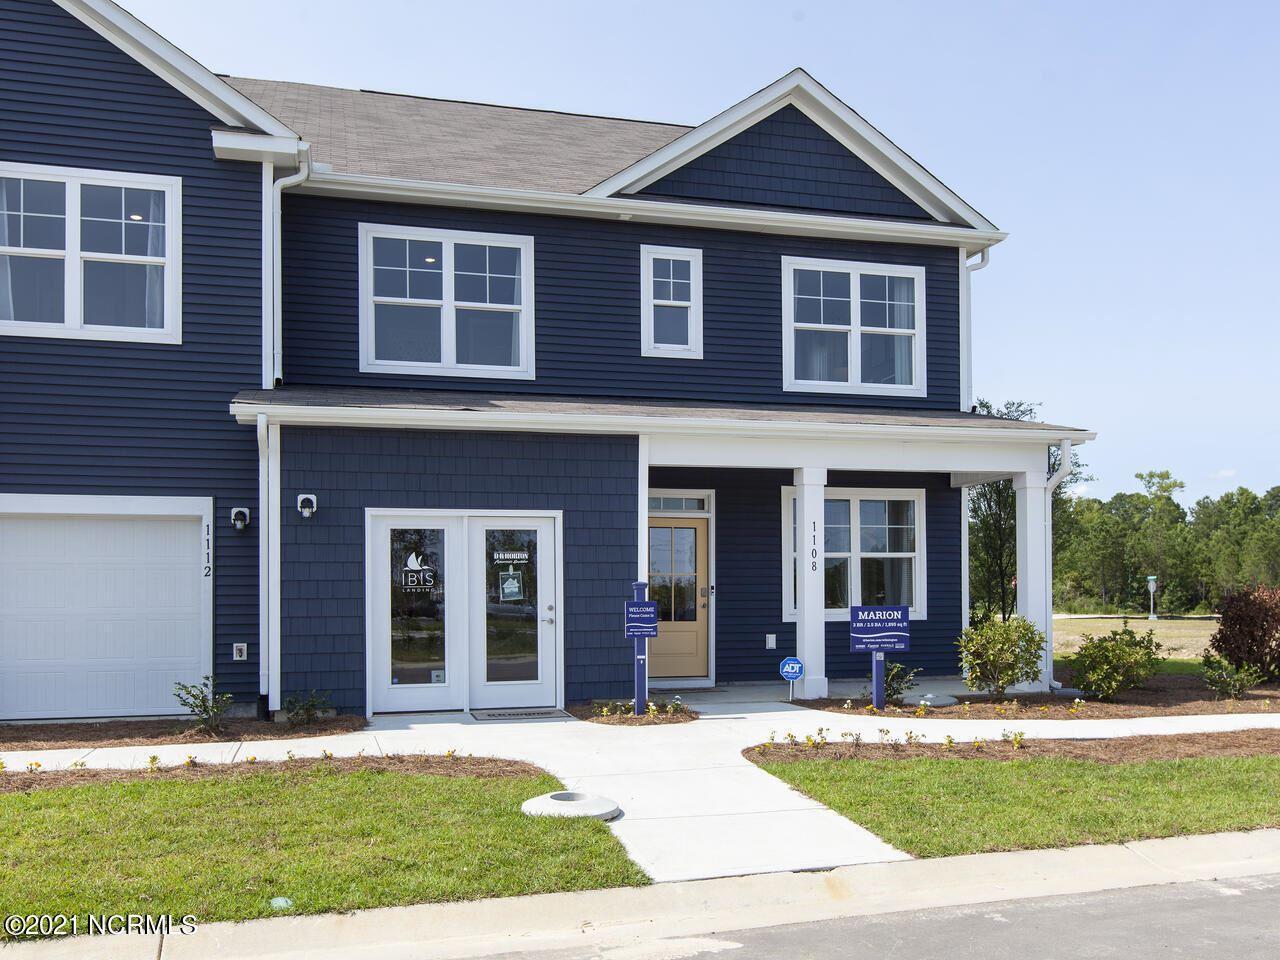 Photo of 7578 Knightbell Circle #Lot 54, Leland, NC 28451 (MLS # 100290209)